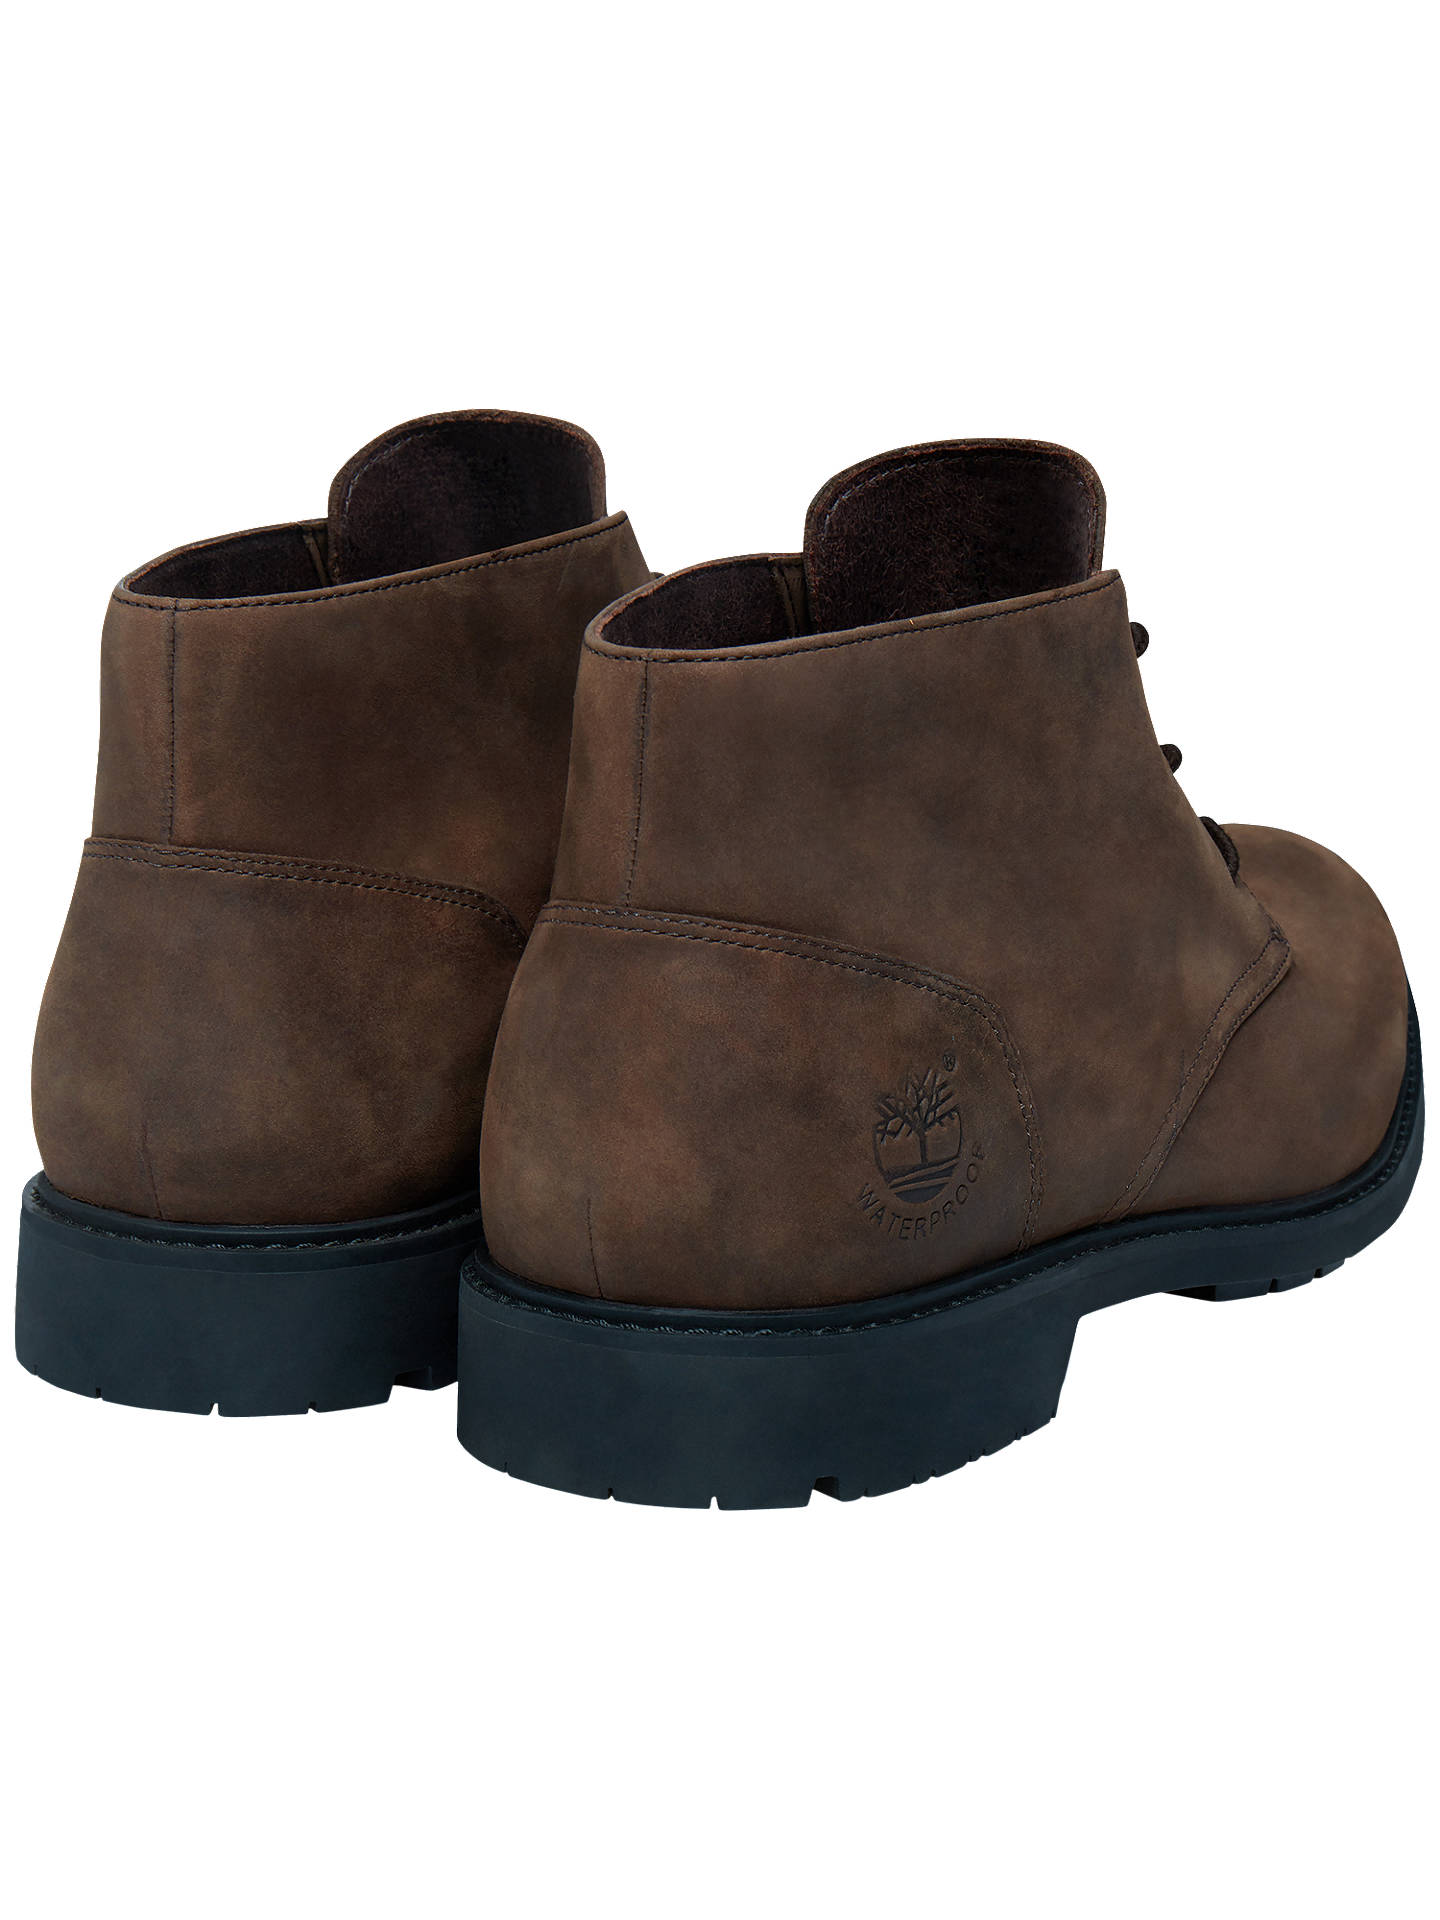 Timberland Stormbuck Waterproof Chukka Boots, Dark Brown at